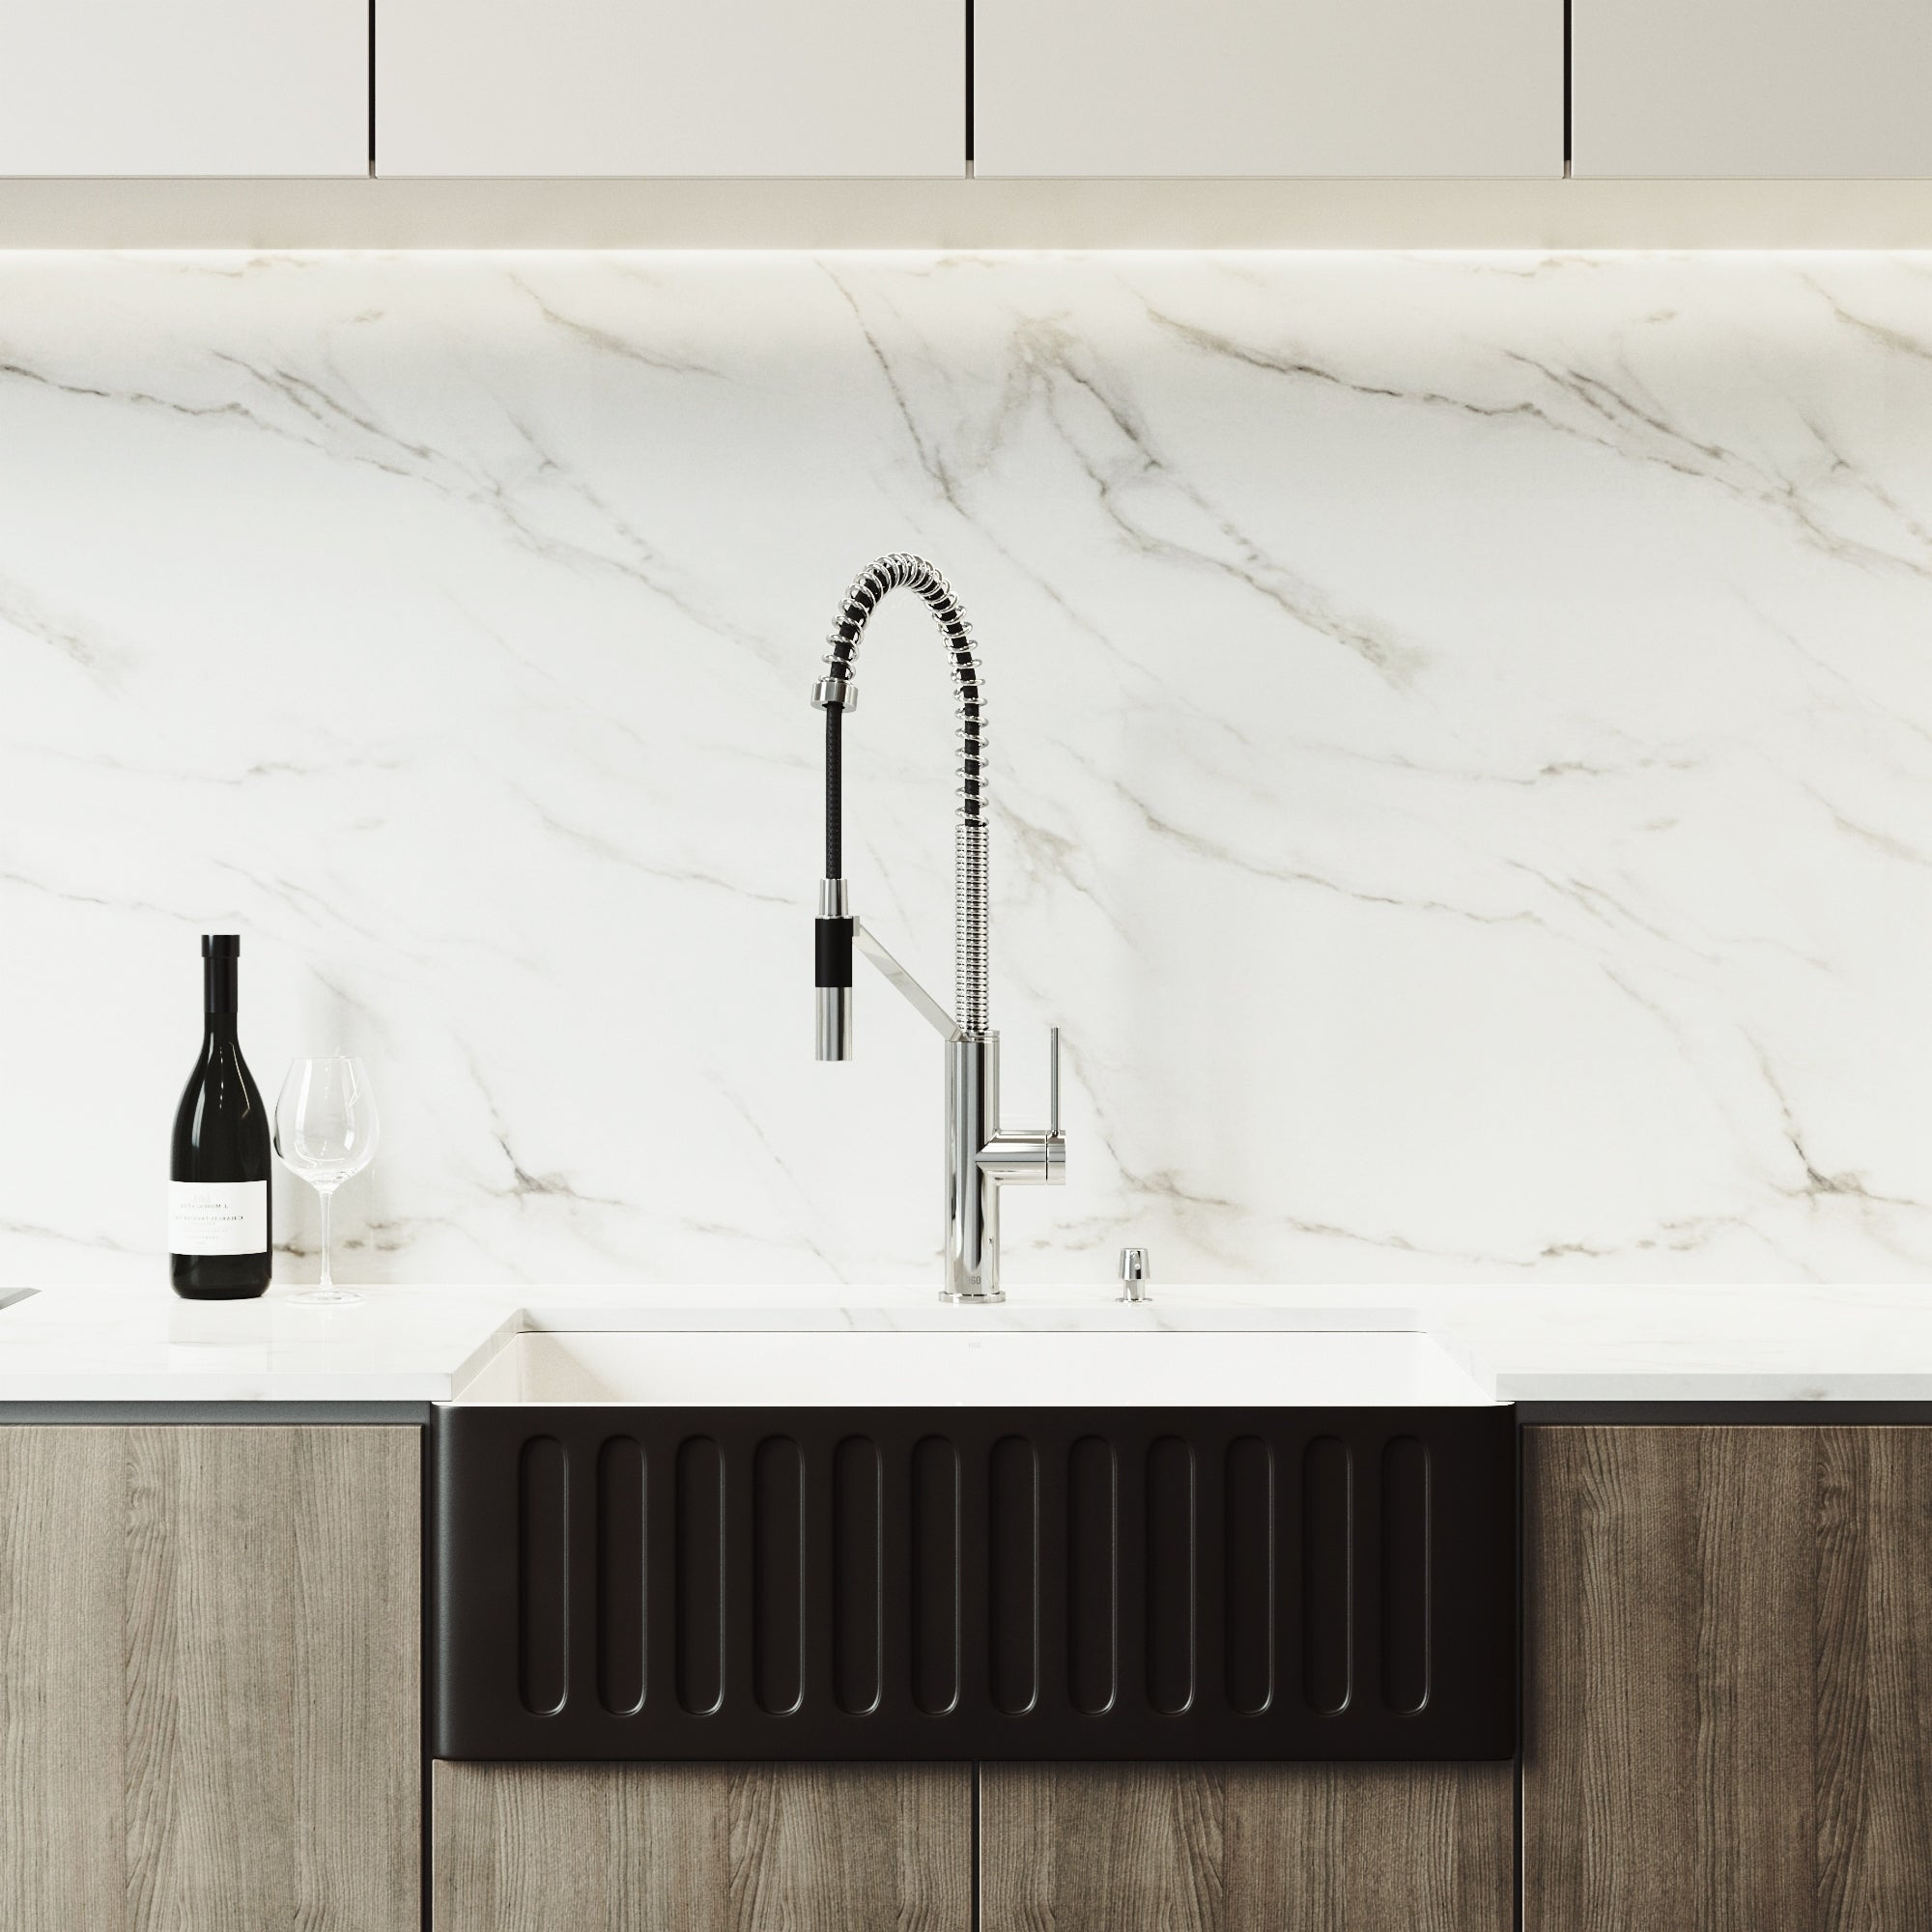 Vigo Black Kitchen Sink Set And Livingston Magnetic Kitchen Faucet Overstock 25416547